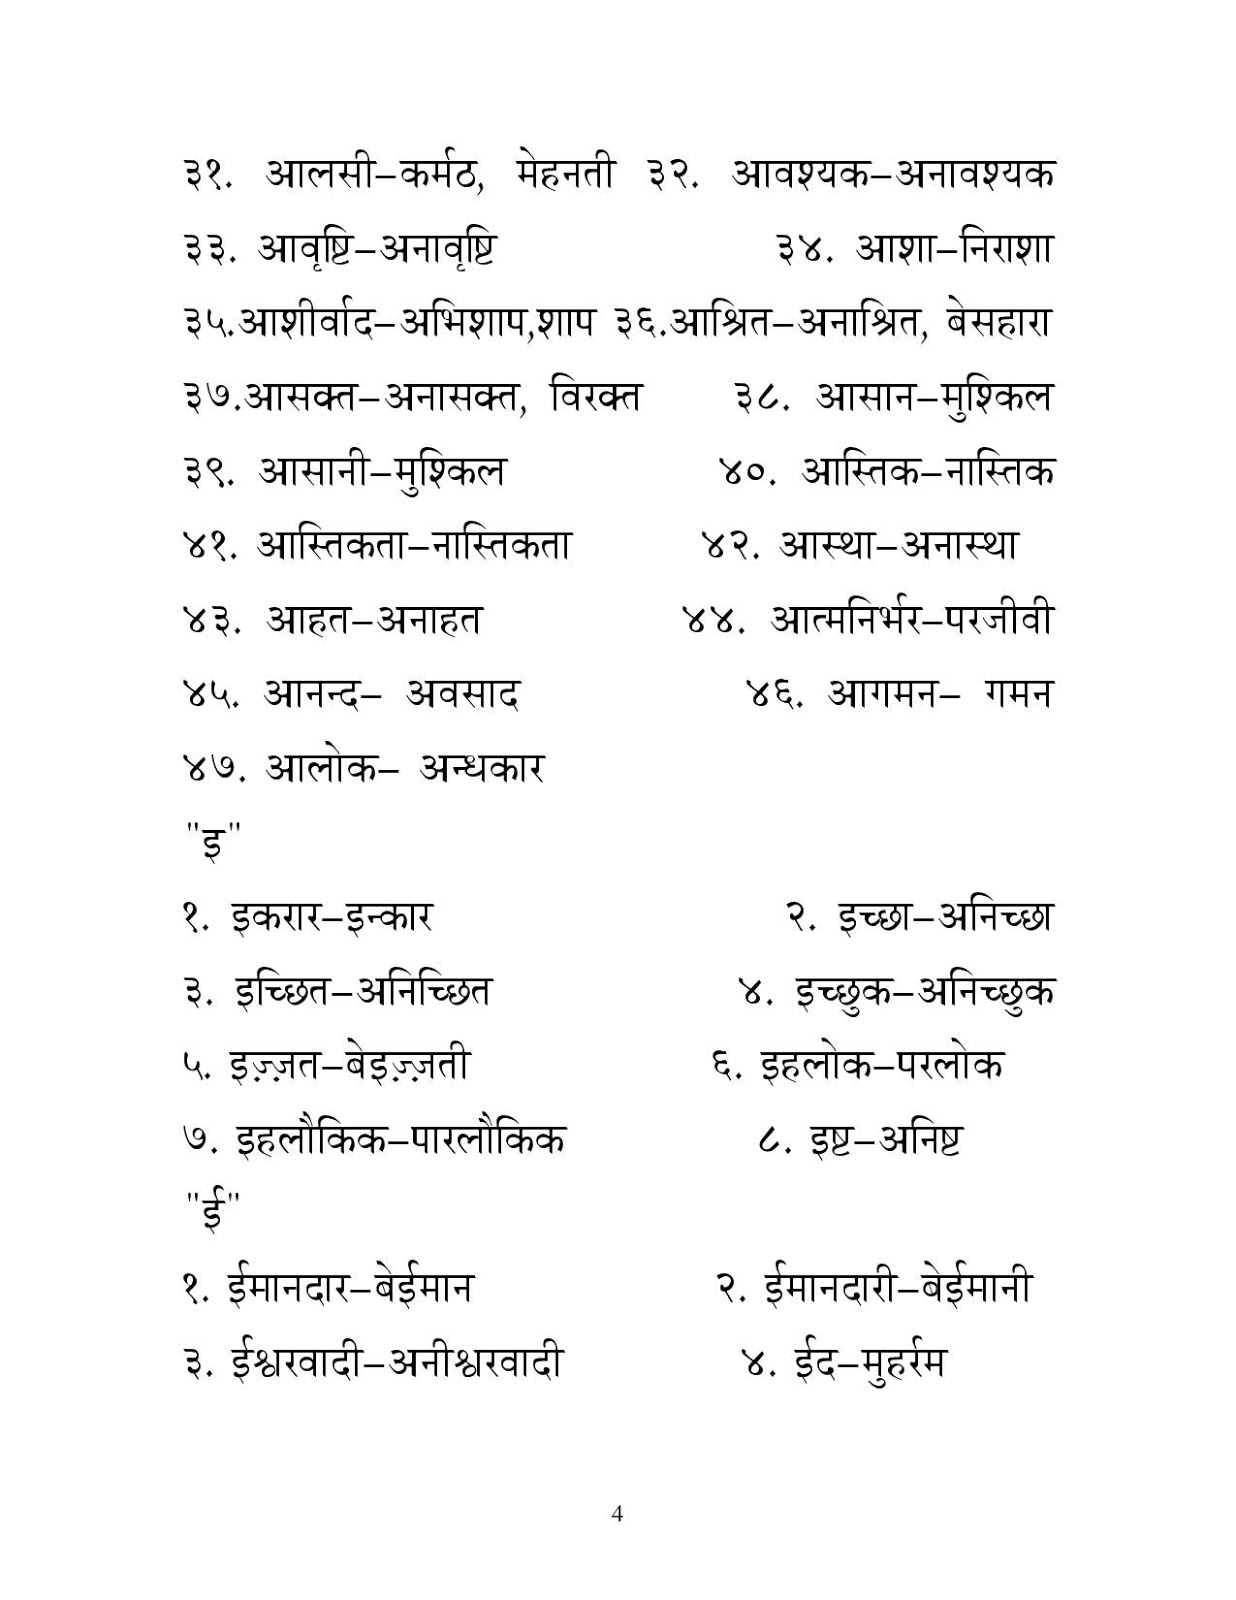 medium resolution of Free Worksheet For Icse Class 6 hindi grammar worksheets for class 6 icse  kendriya vidyalaya